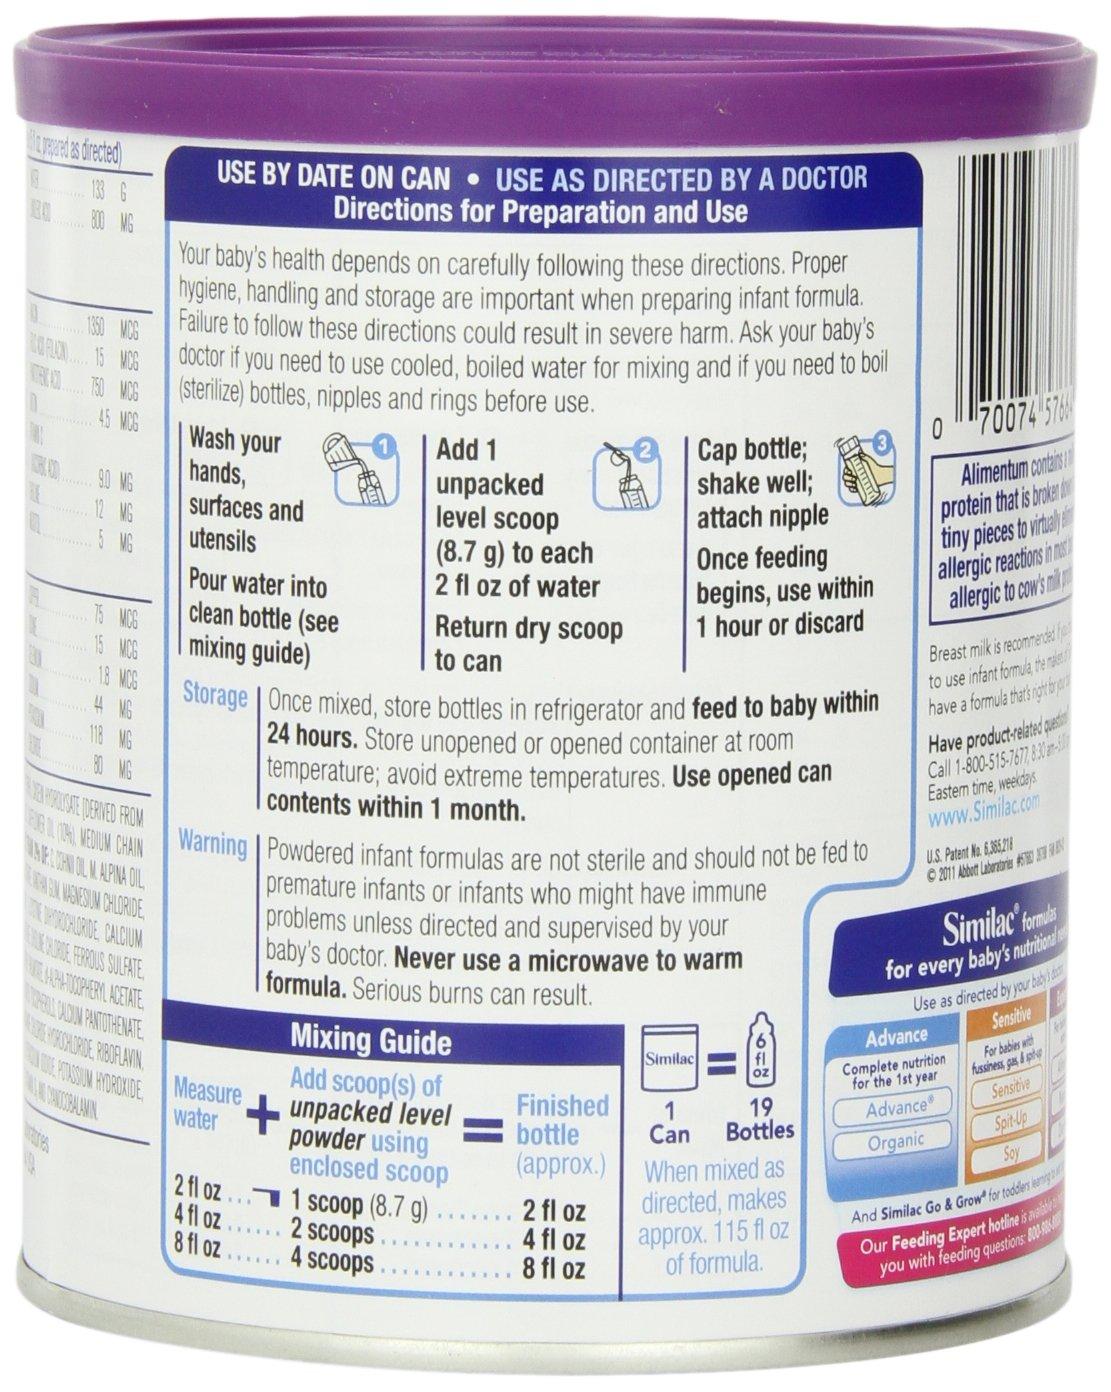 ... Infant Formula, Powder, With Iron, 1-Pound (454 g) (Pack of 6